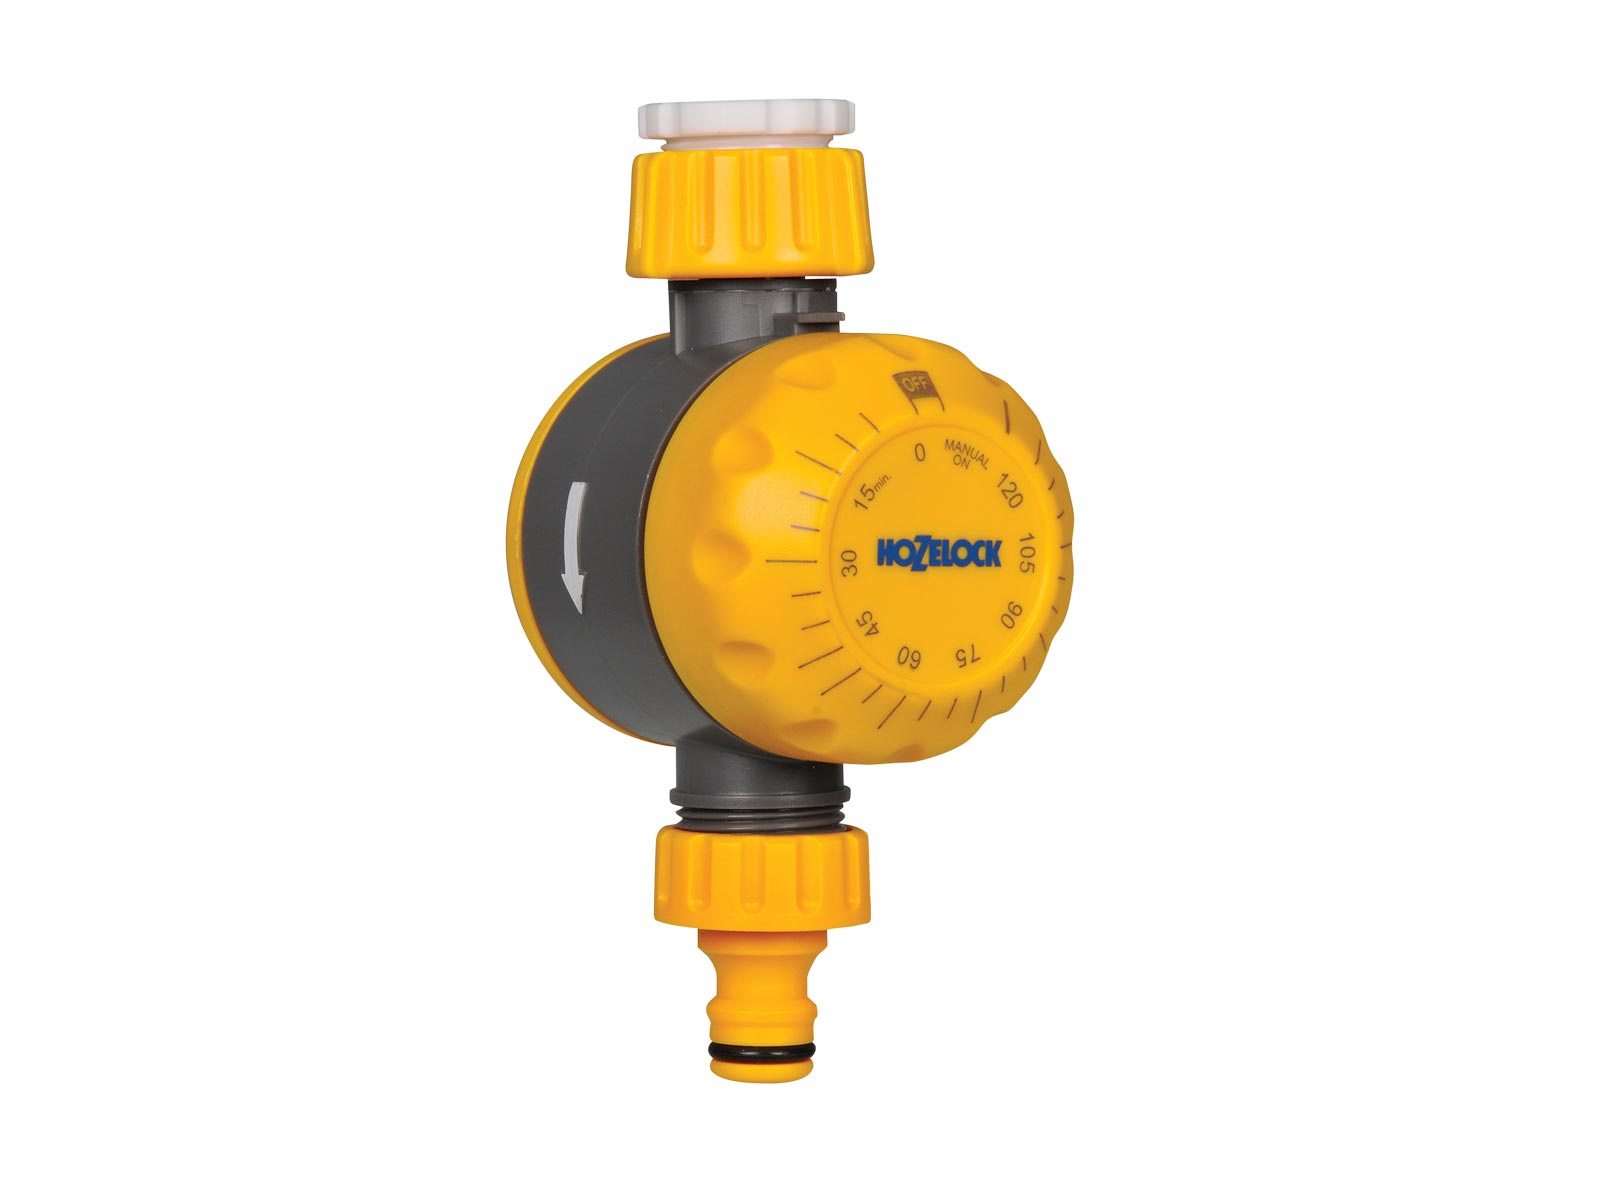 Система полива Hozelock 2210 таймер полива механический, желтый, серый, белый